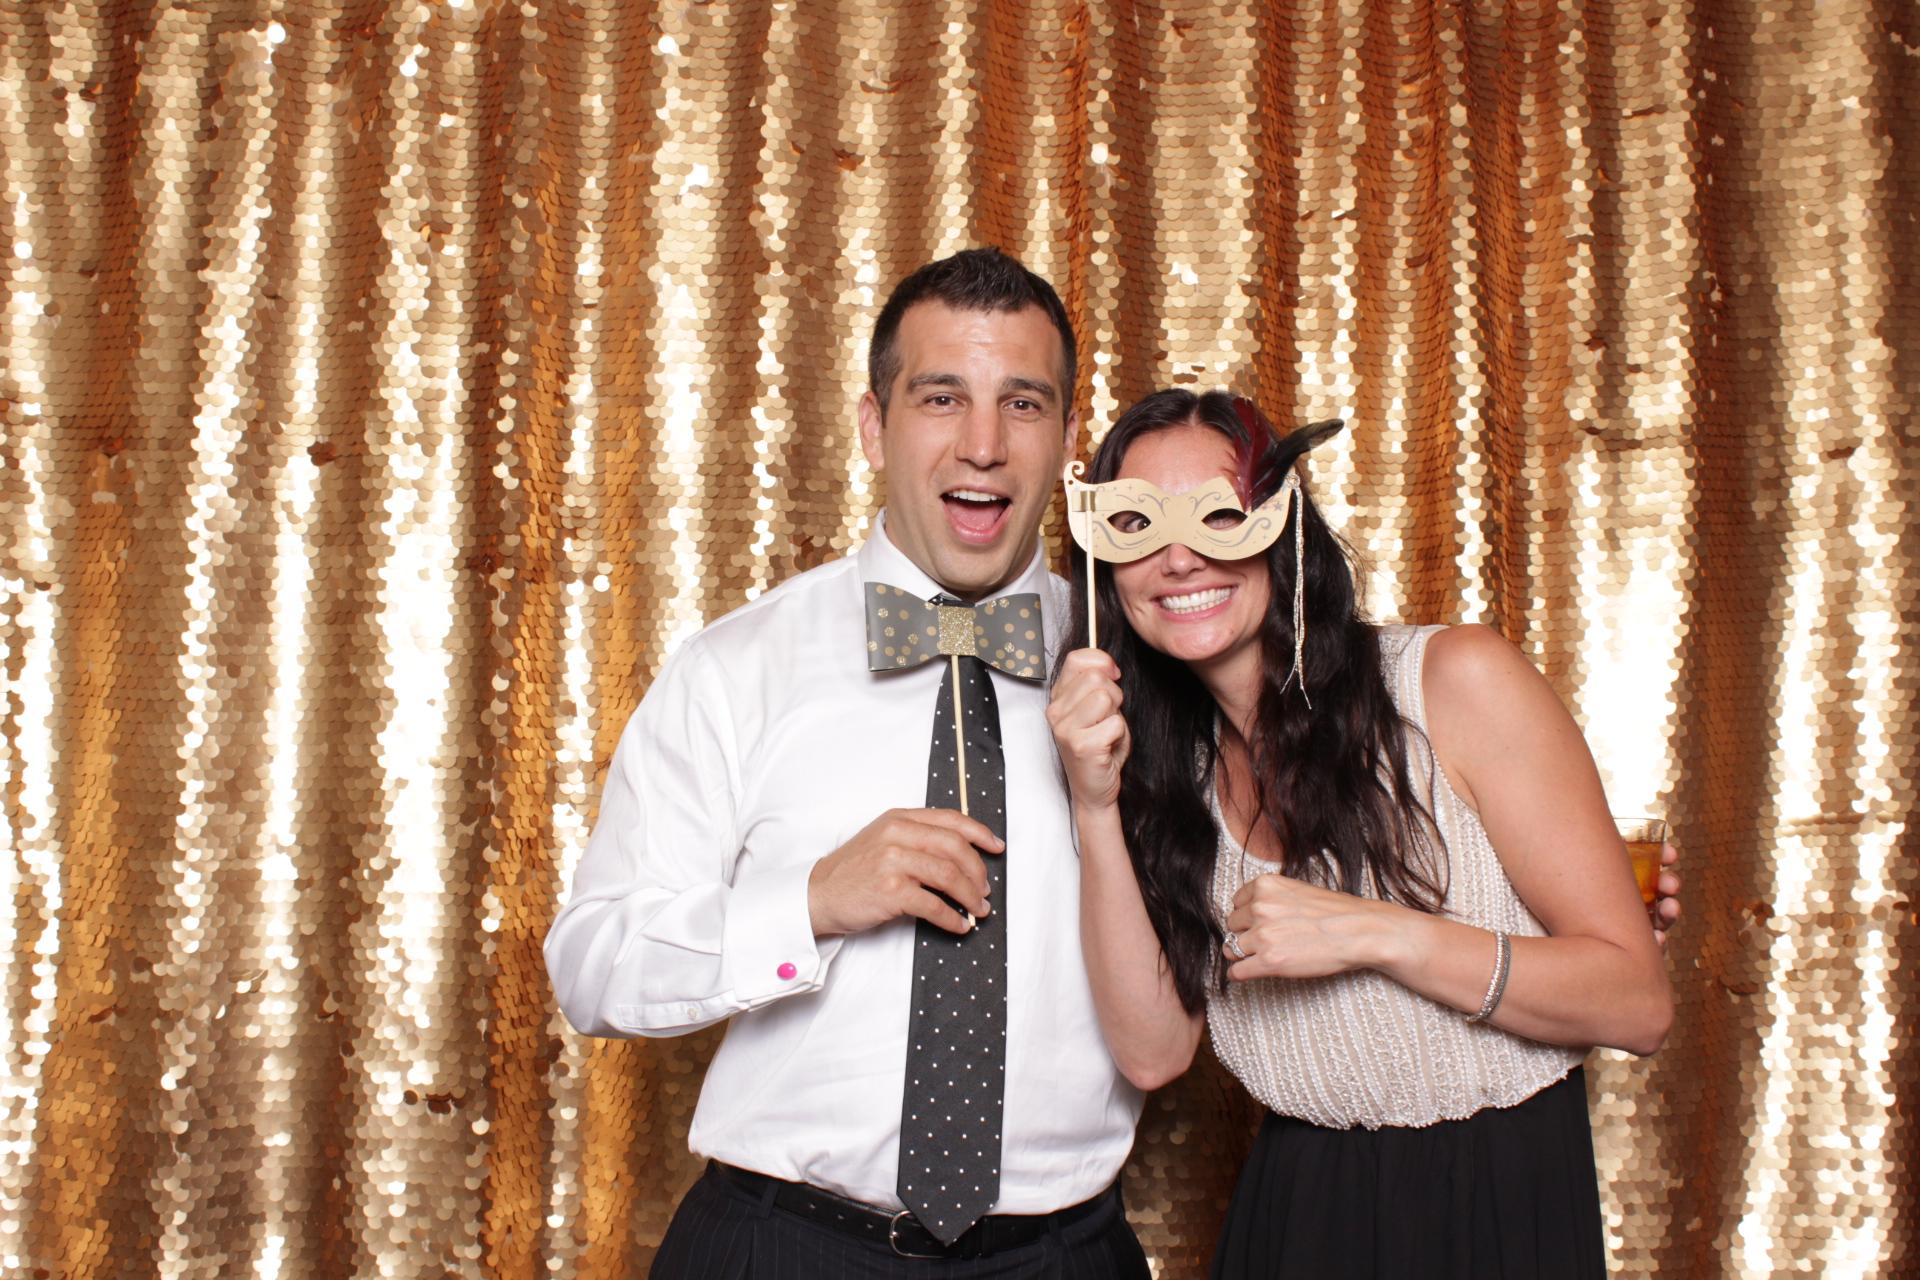 Minneapolis_wedding_photo_booth_Machine_Shop (12).jpg